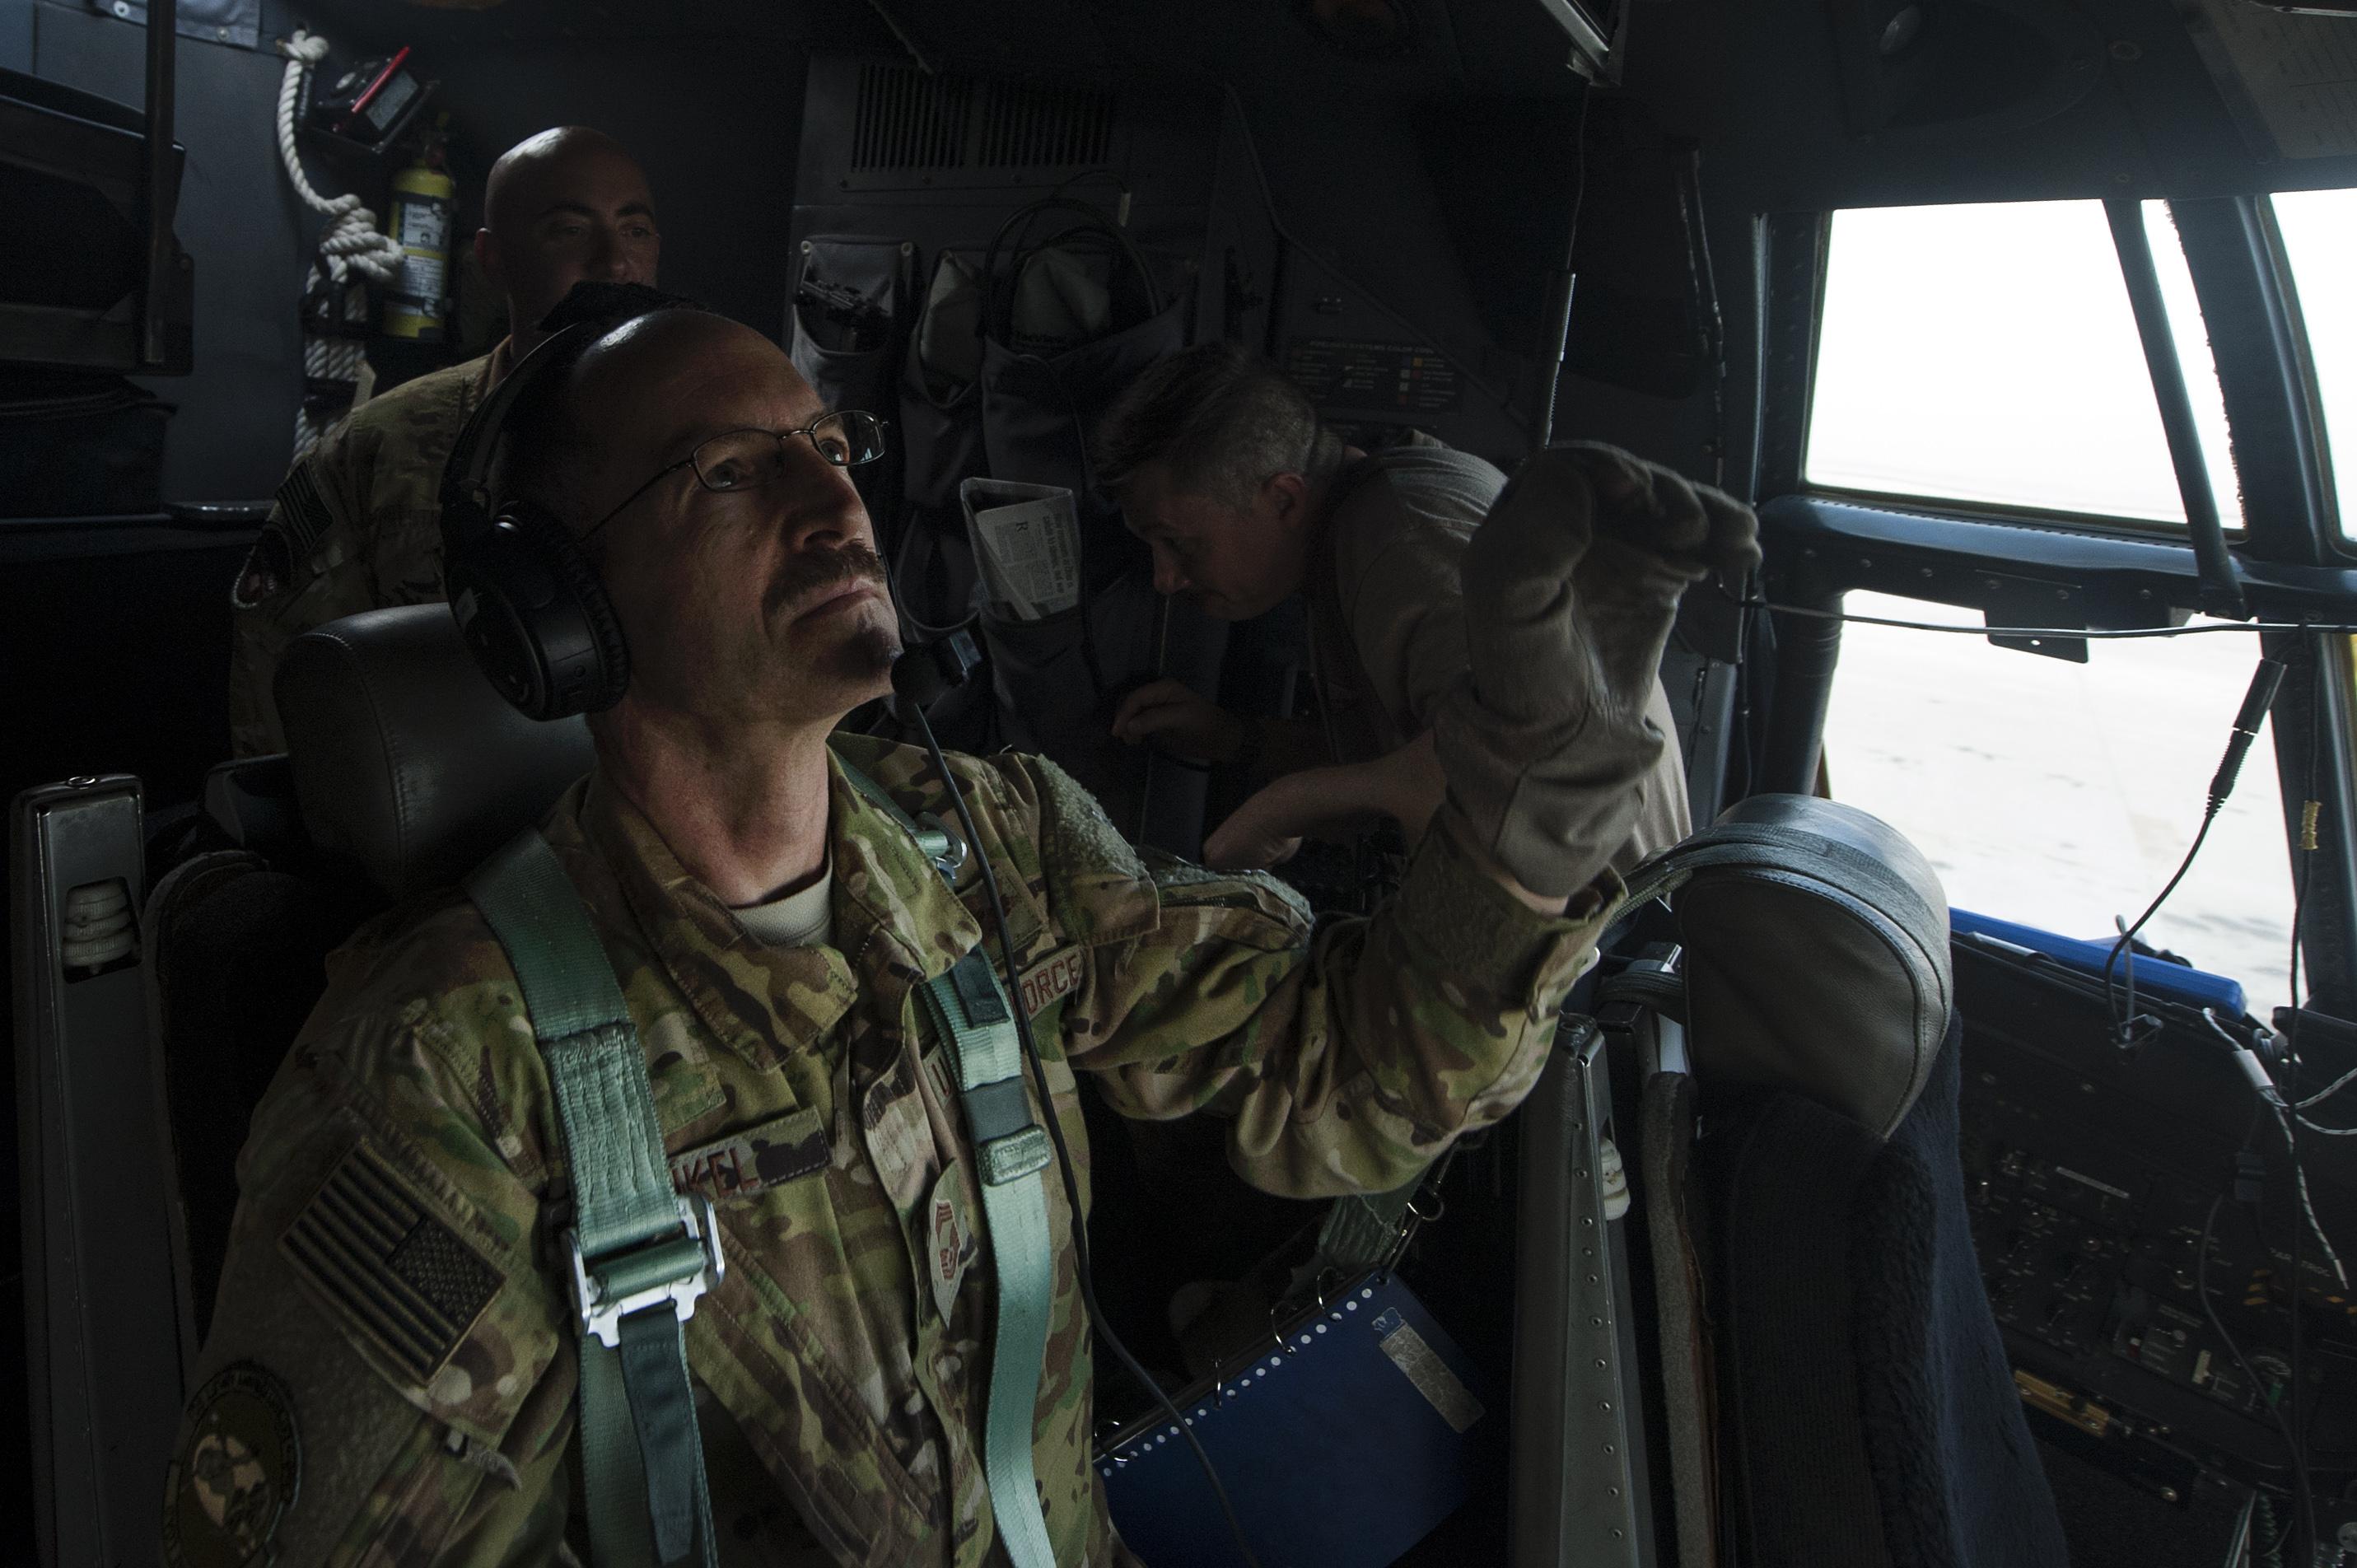 Flight Engineer passes rare milestone